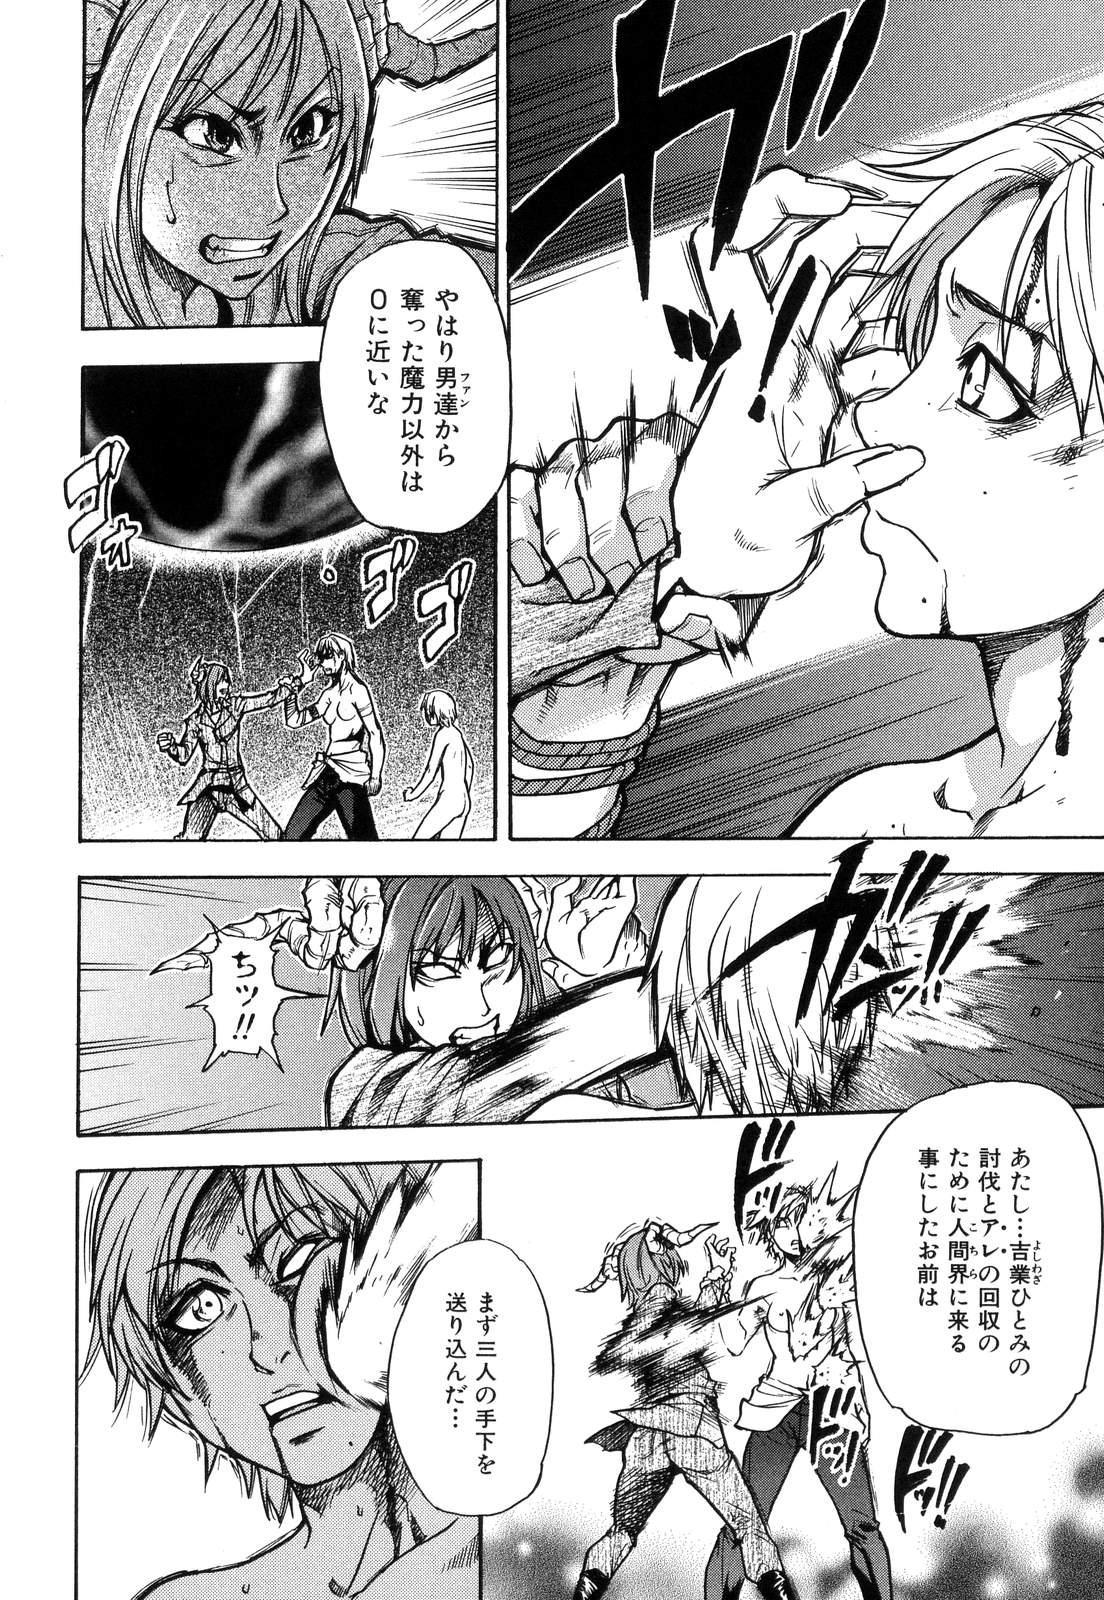 Shining Musume. 6. Rainbow Six 192